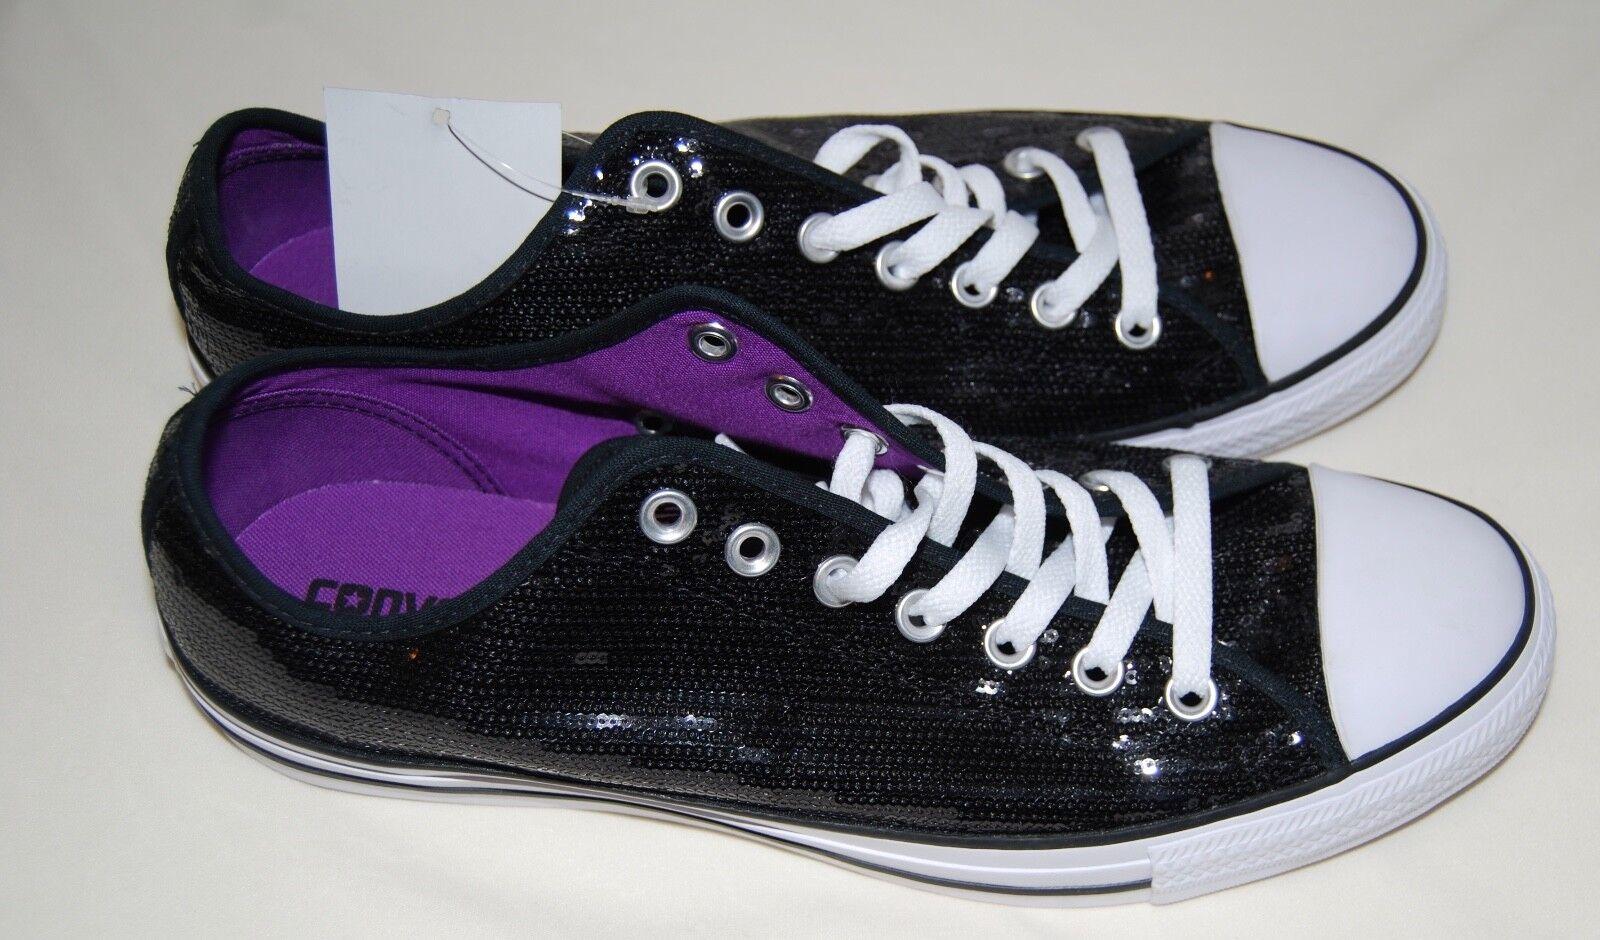 NWOB Converse All Star Chuck Taylor Femme Noir Sequined Sneakers Wm sz 12 13